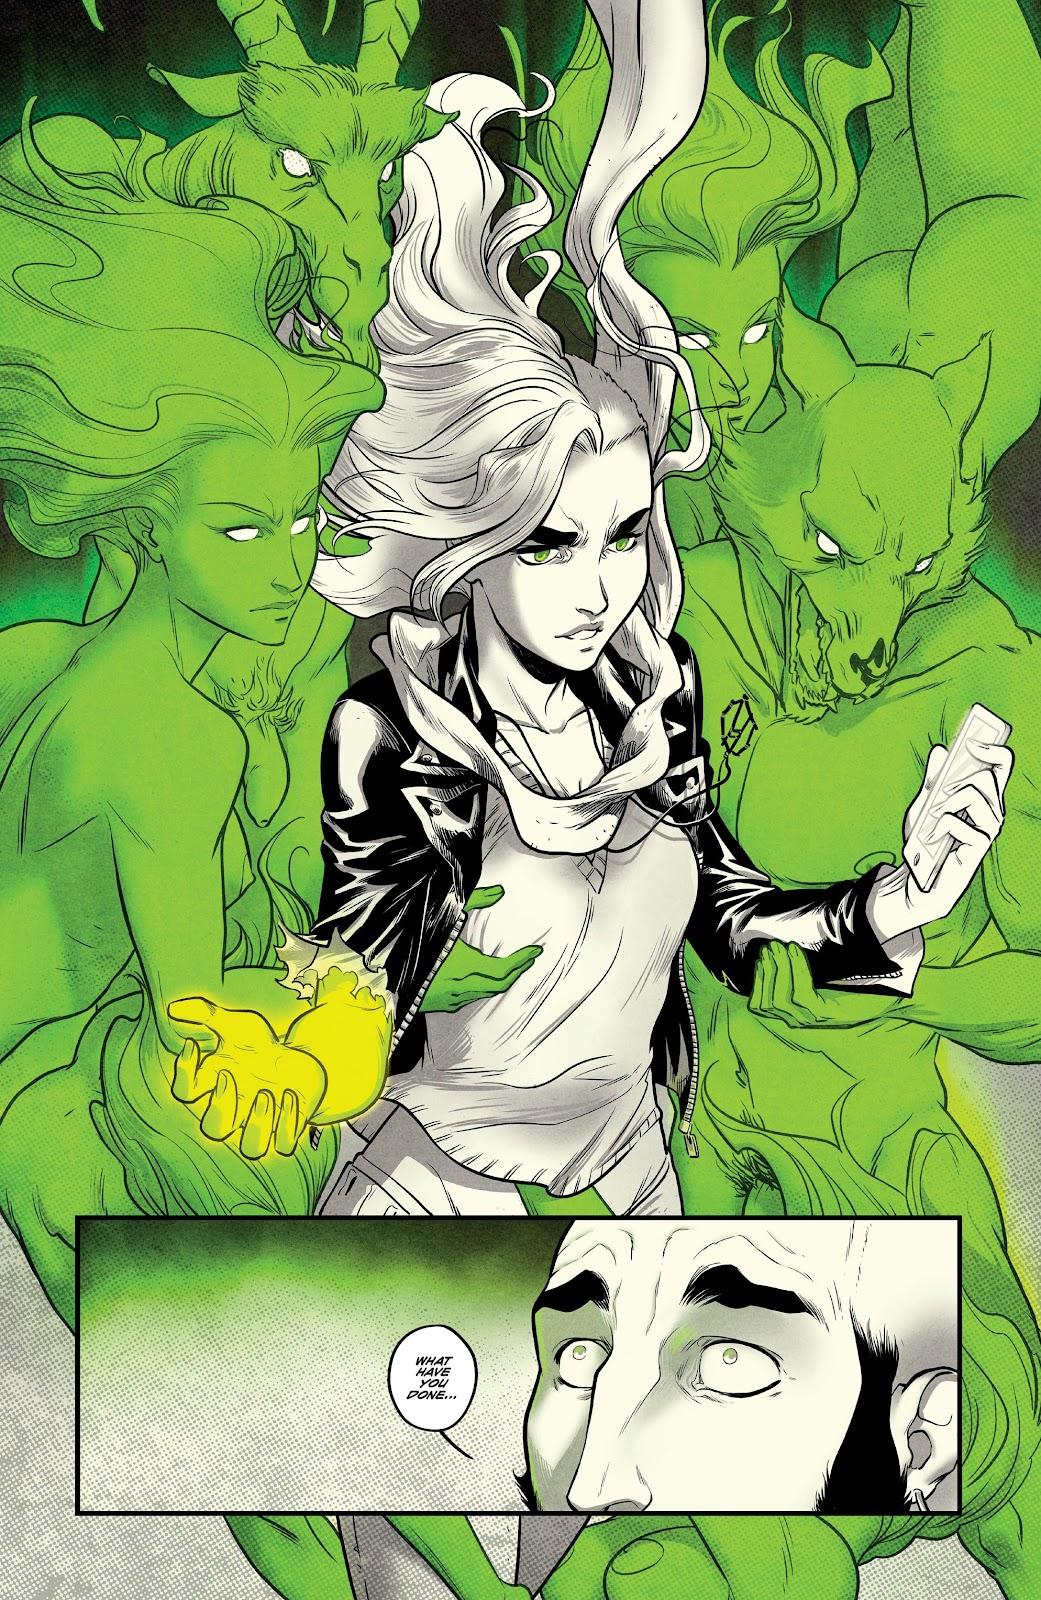 Read online Nomen Omen comic -  Issue #6 - 11